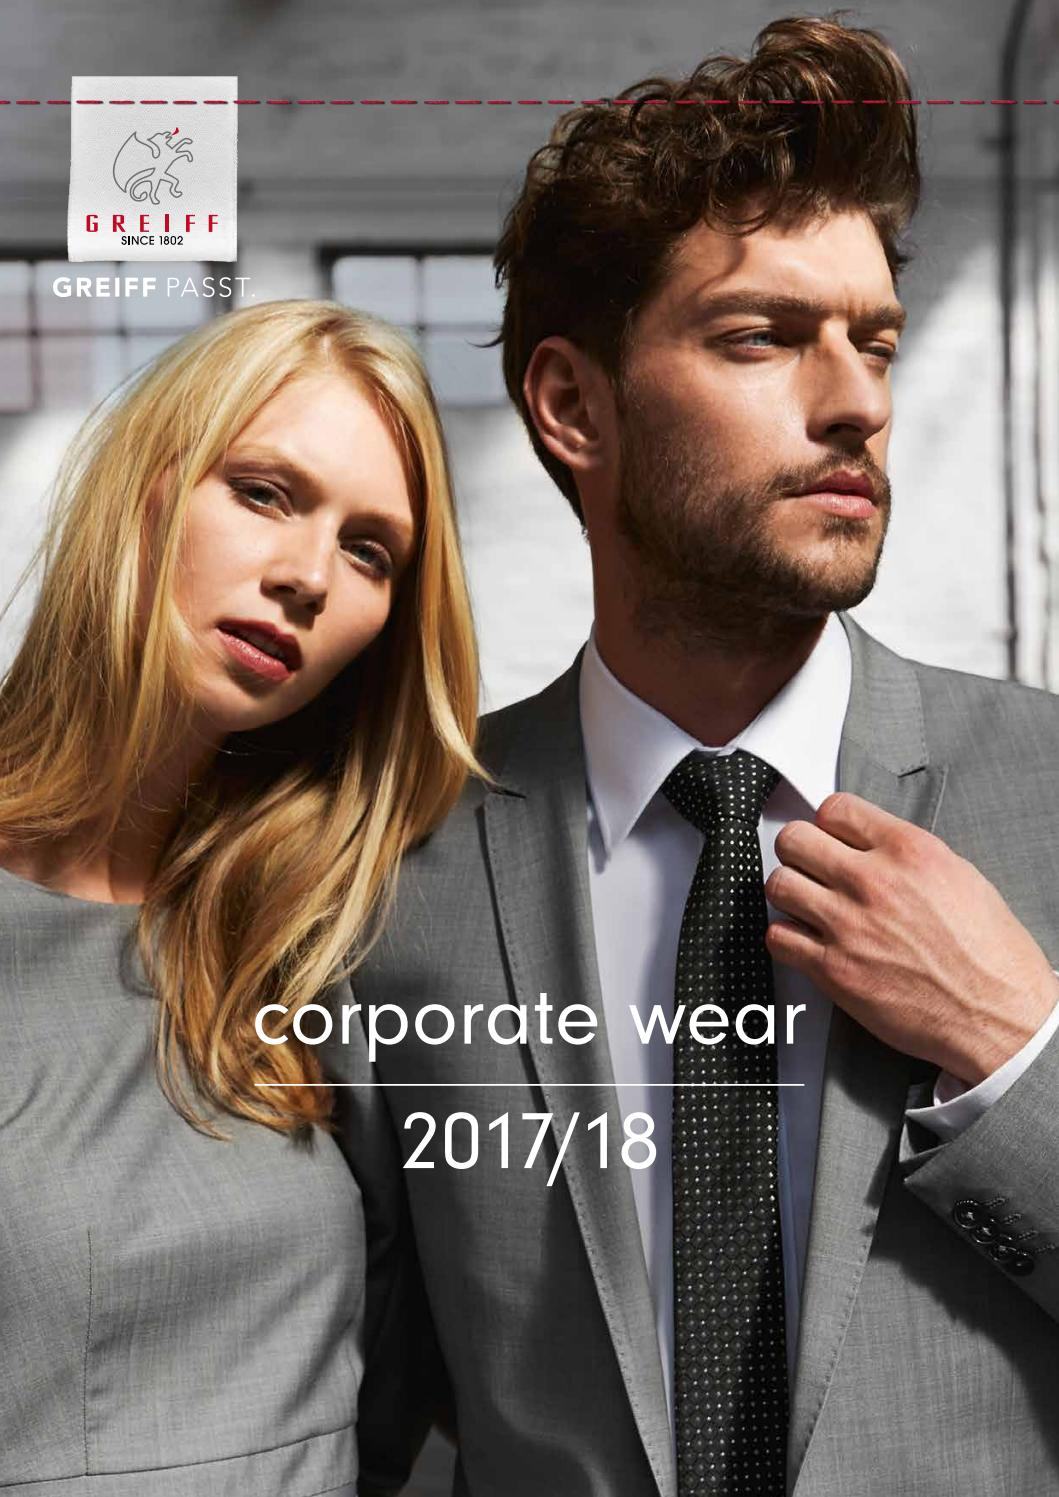 GREIFF Corporate Wear 2017 By Vignashop.com By VIGNASHOP.COM   Issuu